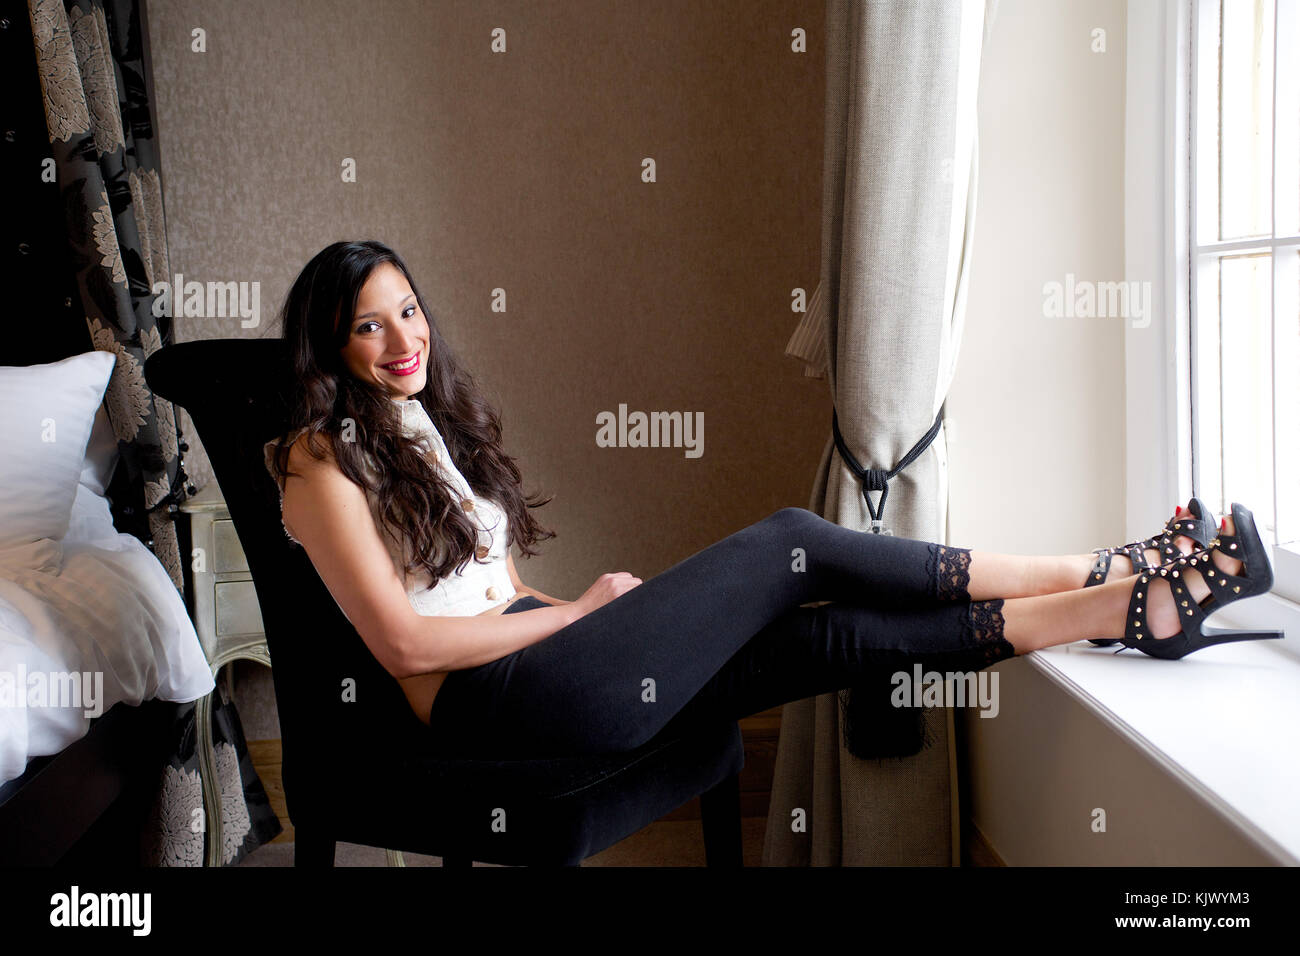 Beautiful brunette girl wearing black leggings in a bedroom location - Stock Image